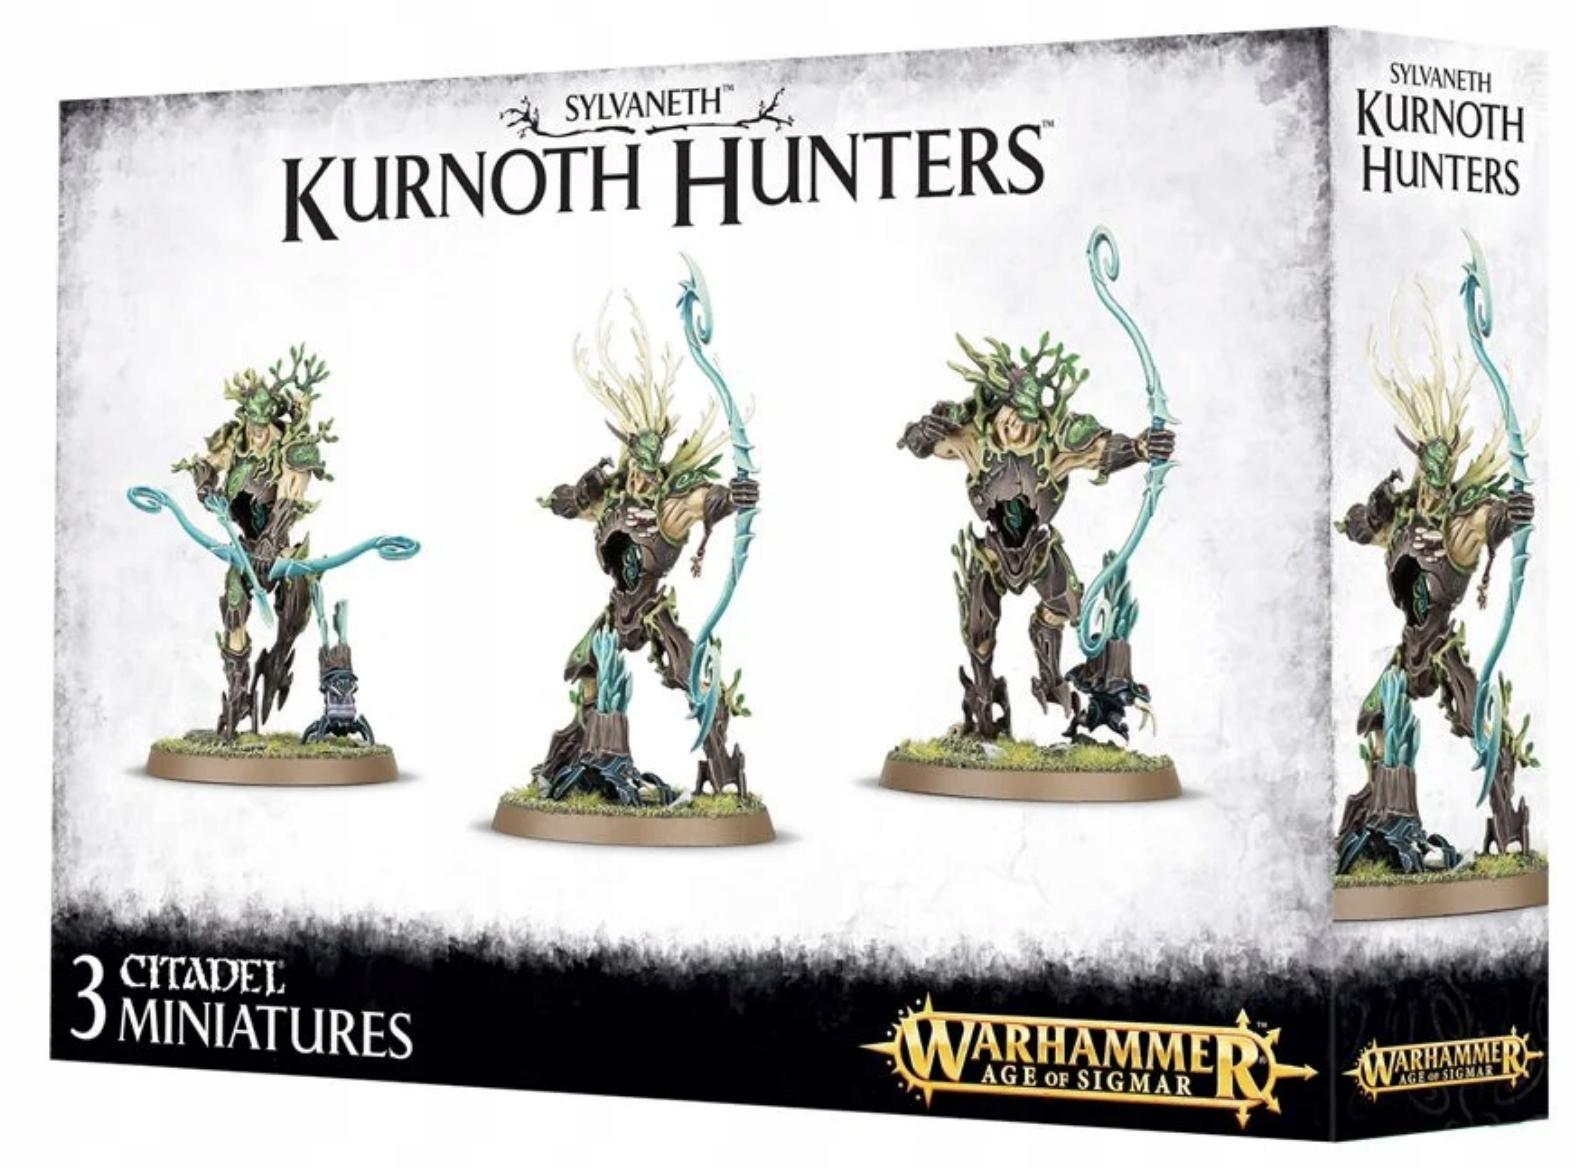 Sylvath Kurnoth lovci